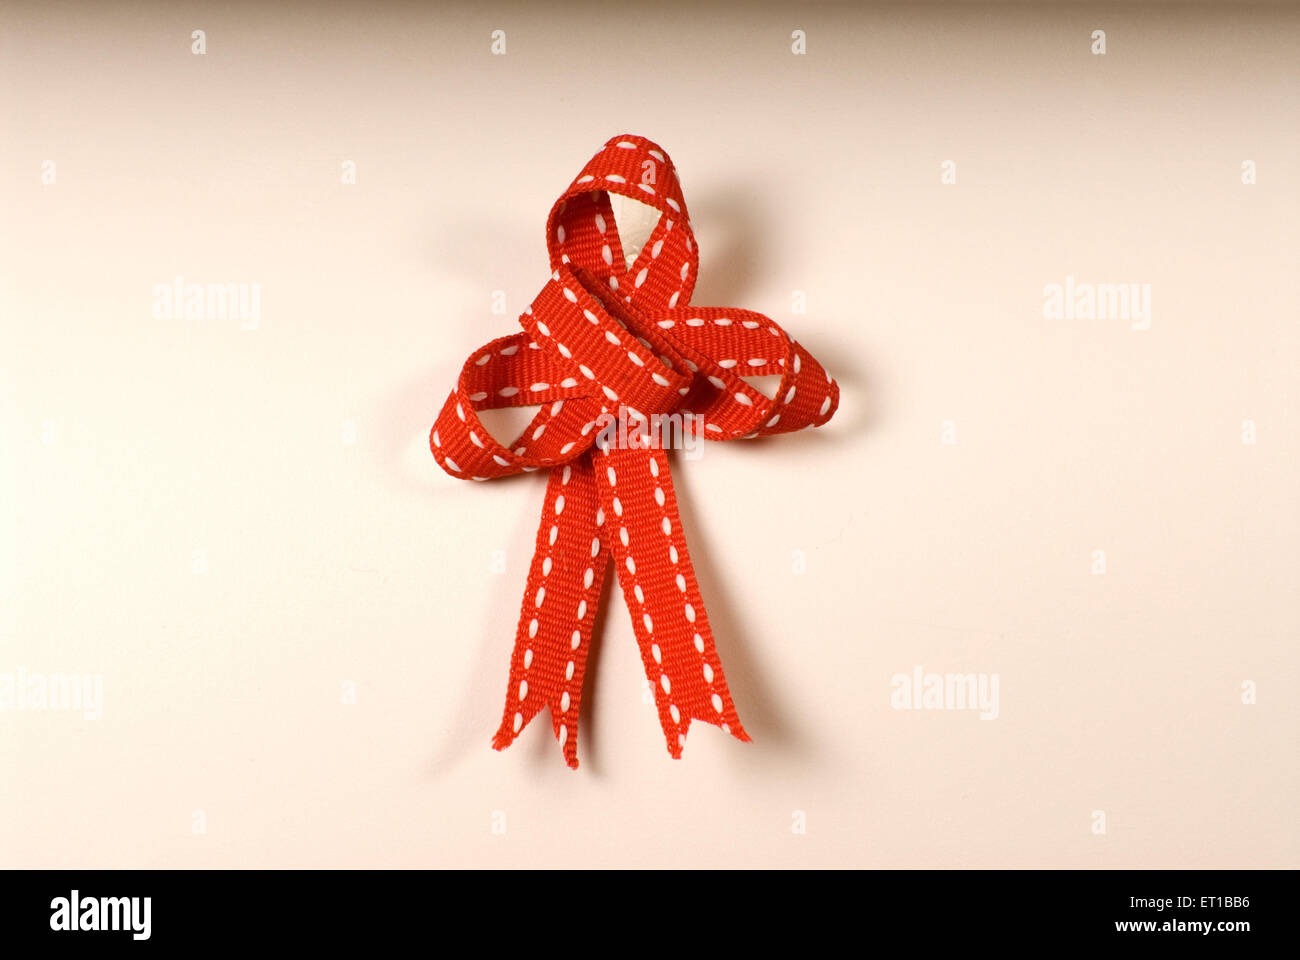 Nœud de ruban sur fond blanc Photo Stock